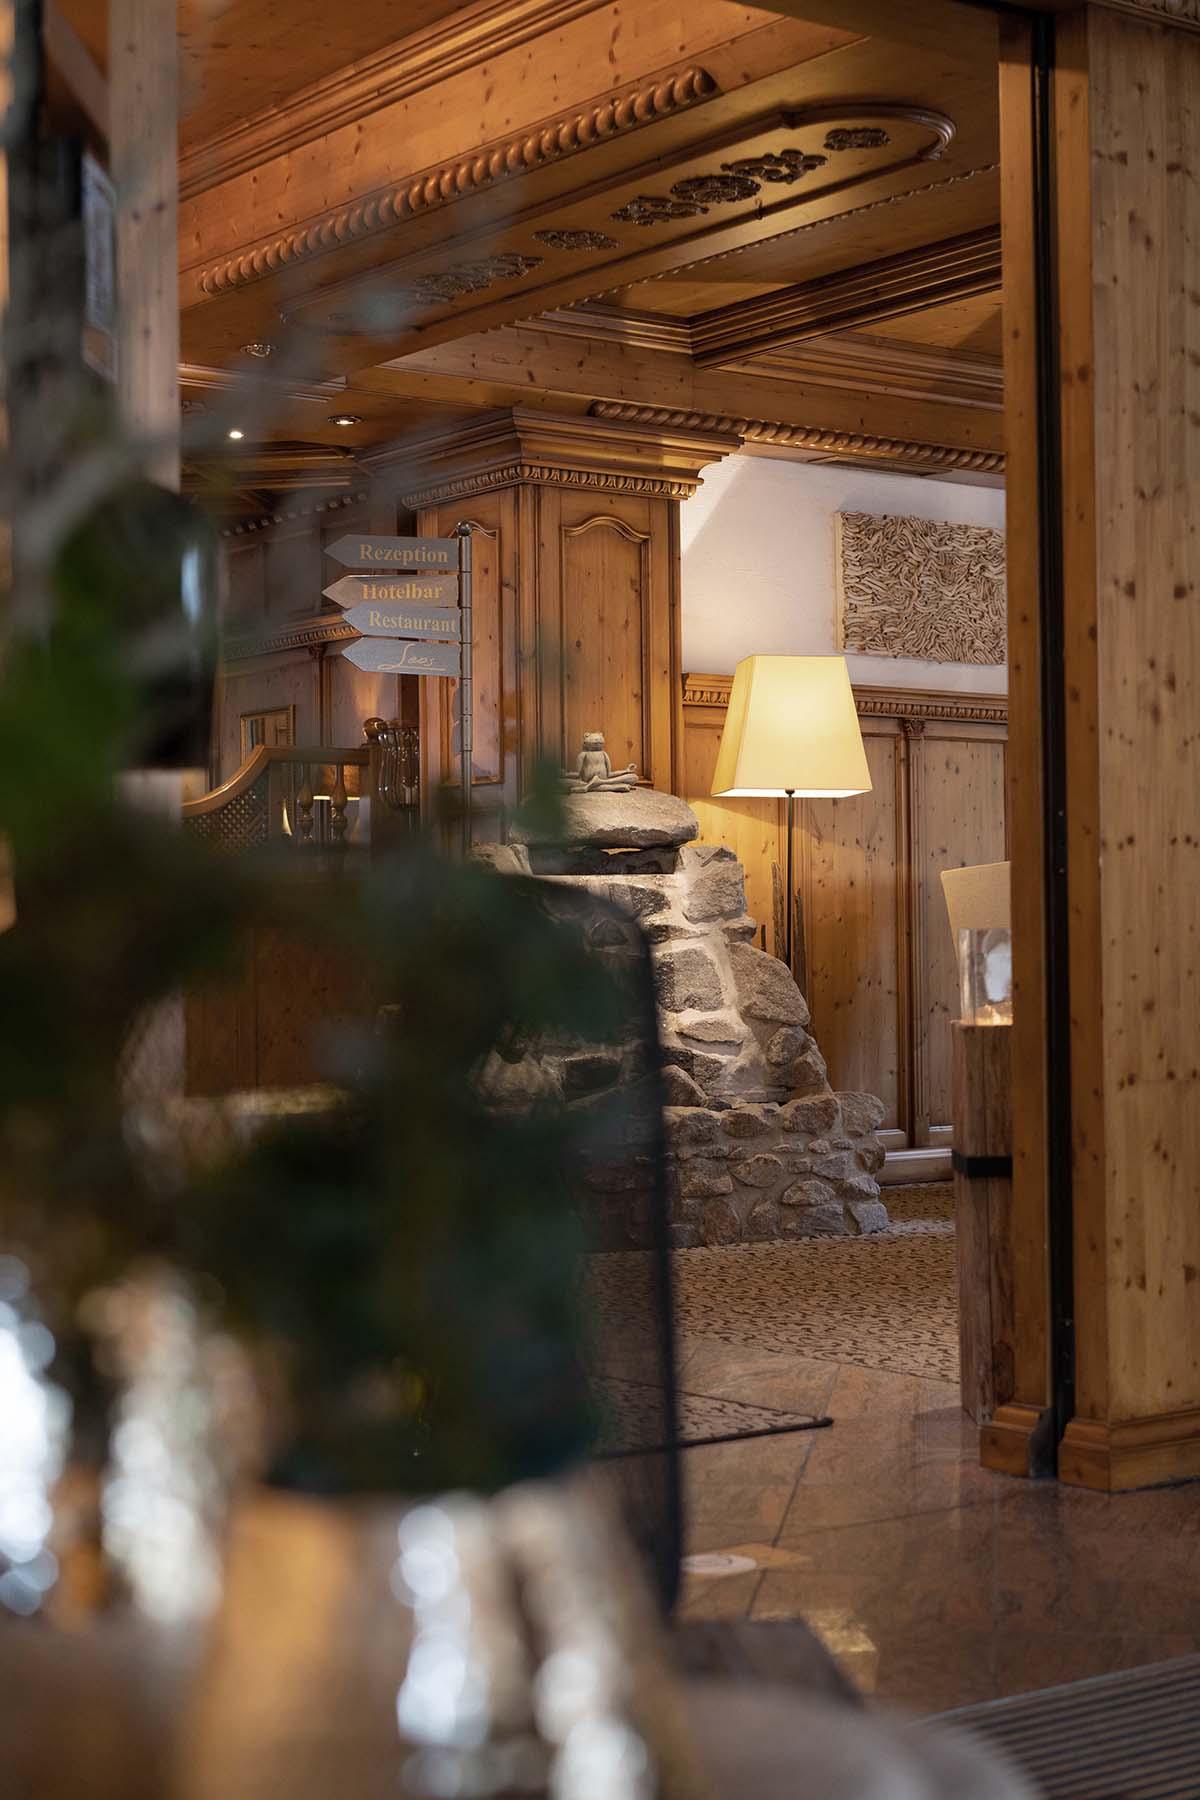 wellnesshotel-bayerwaldhof-detail-01-1